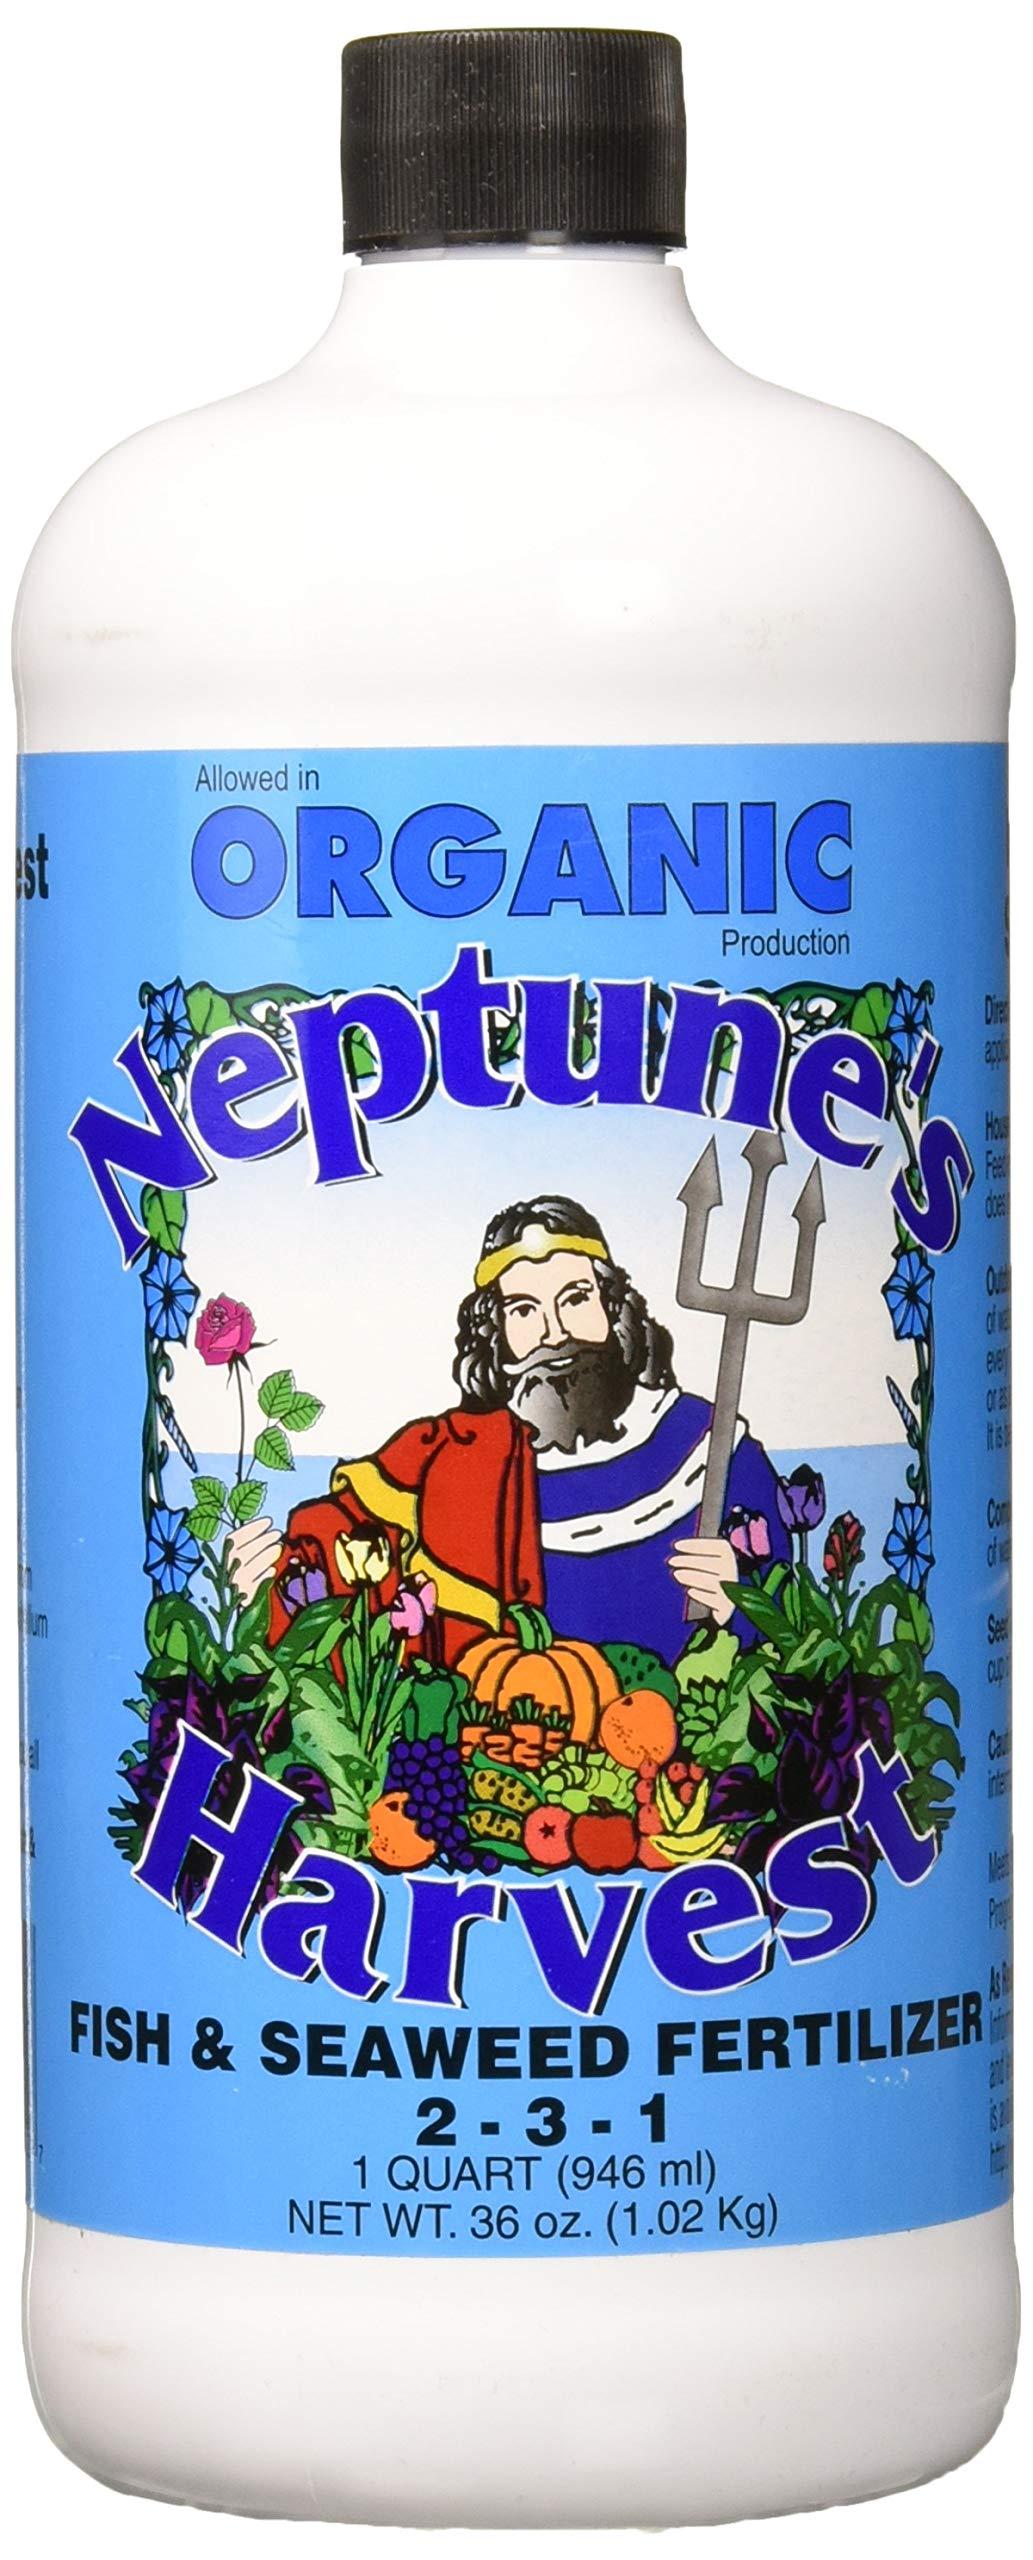 Neptunes Harvest Organic Hydrolized Fertilizer